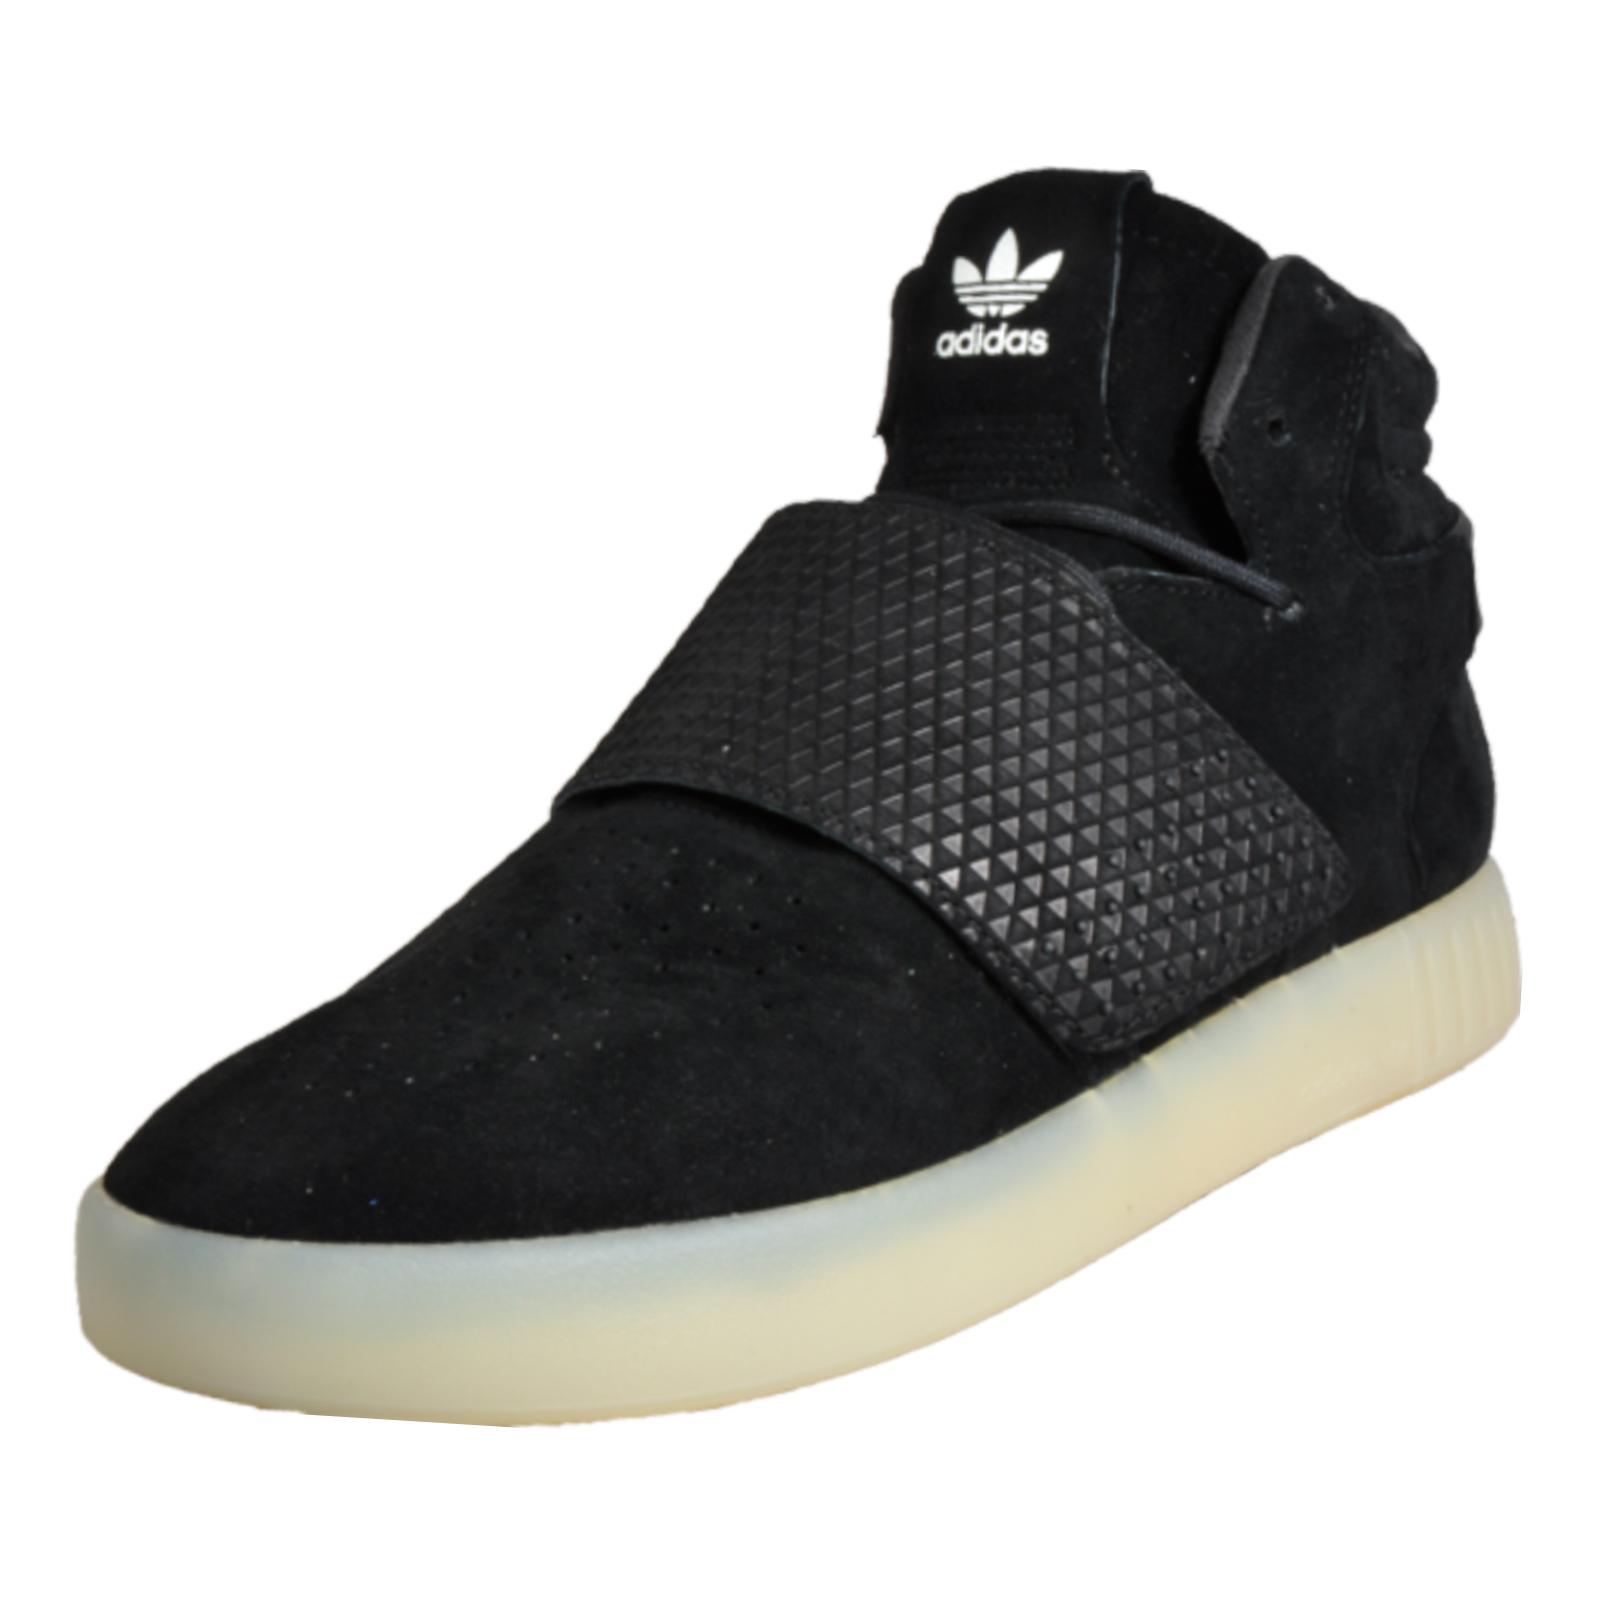 bf57628f27af69 Details about Adidas Originals Tubular Invader Strap Men s Suede Leather Mid  Top Trainers